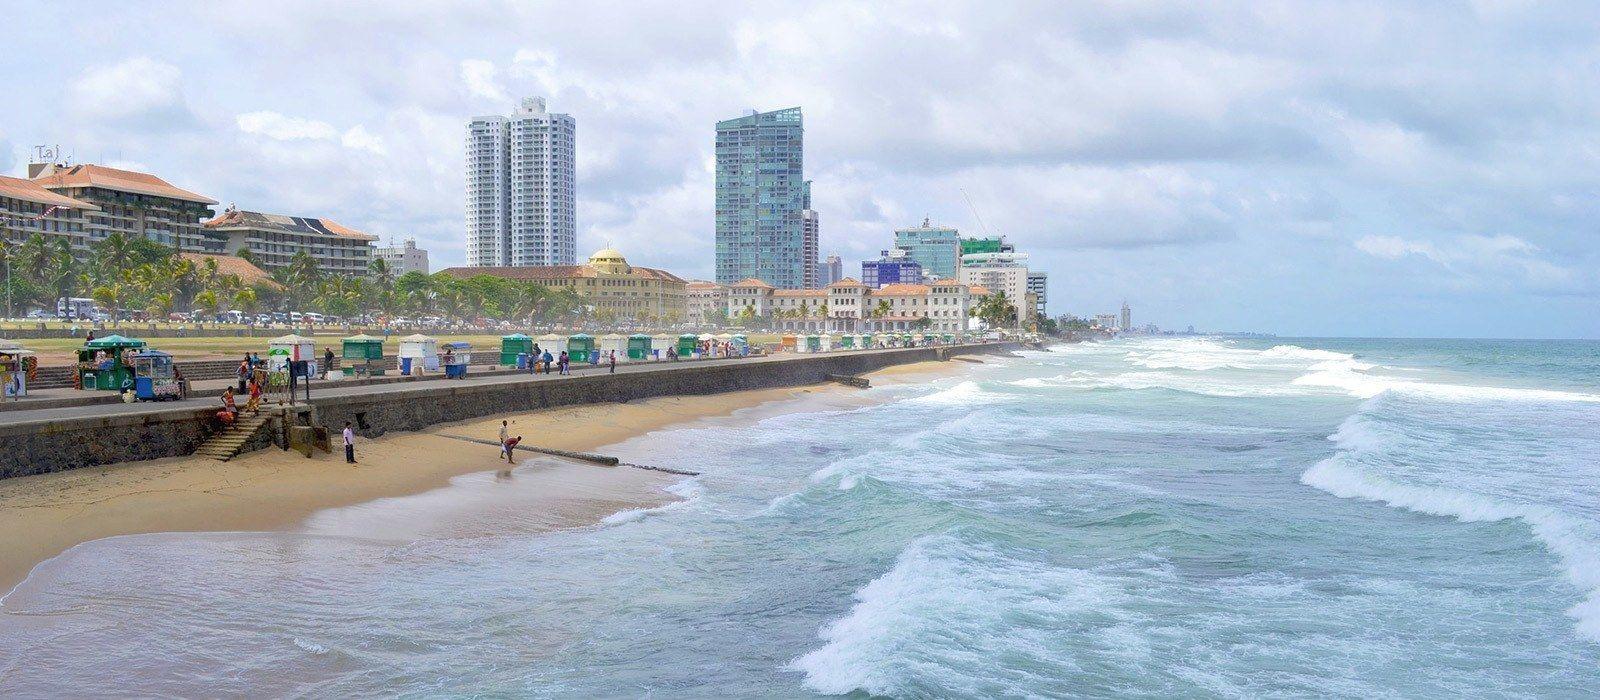 Ancient Wonders and Beaches of Sri Lanka Tour Trip 5